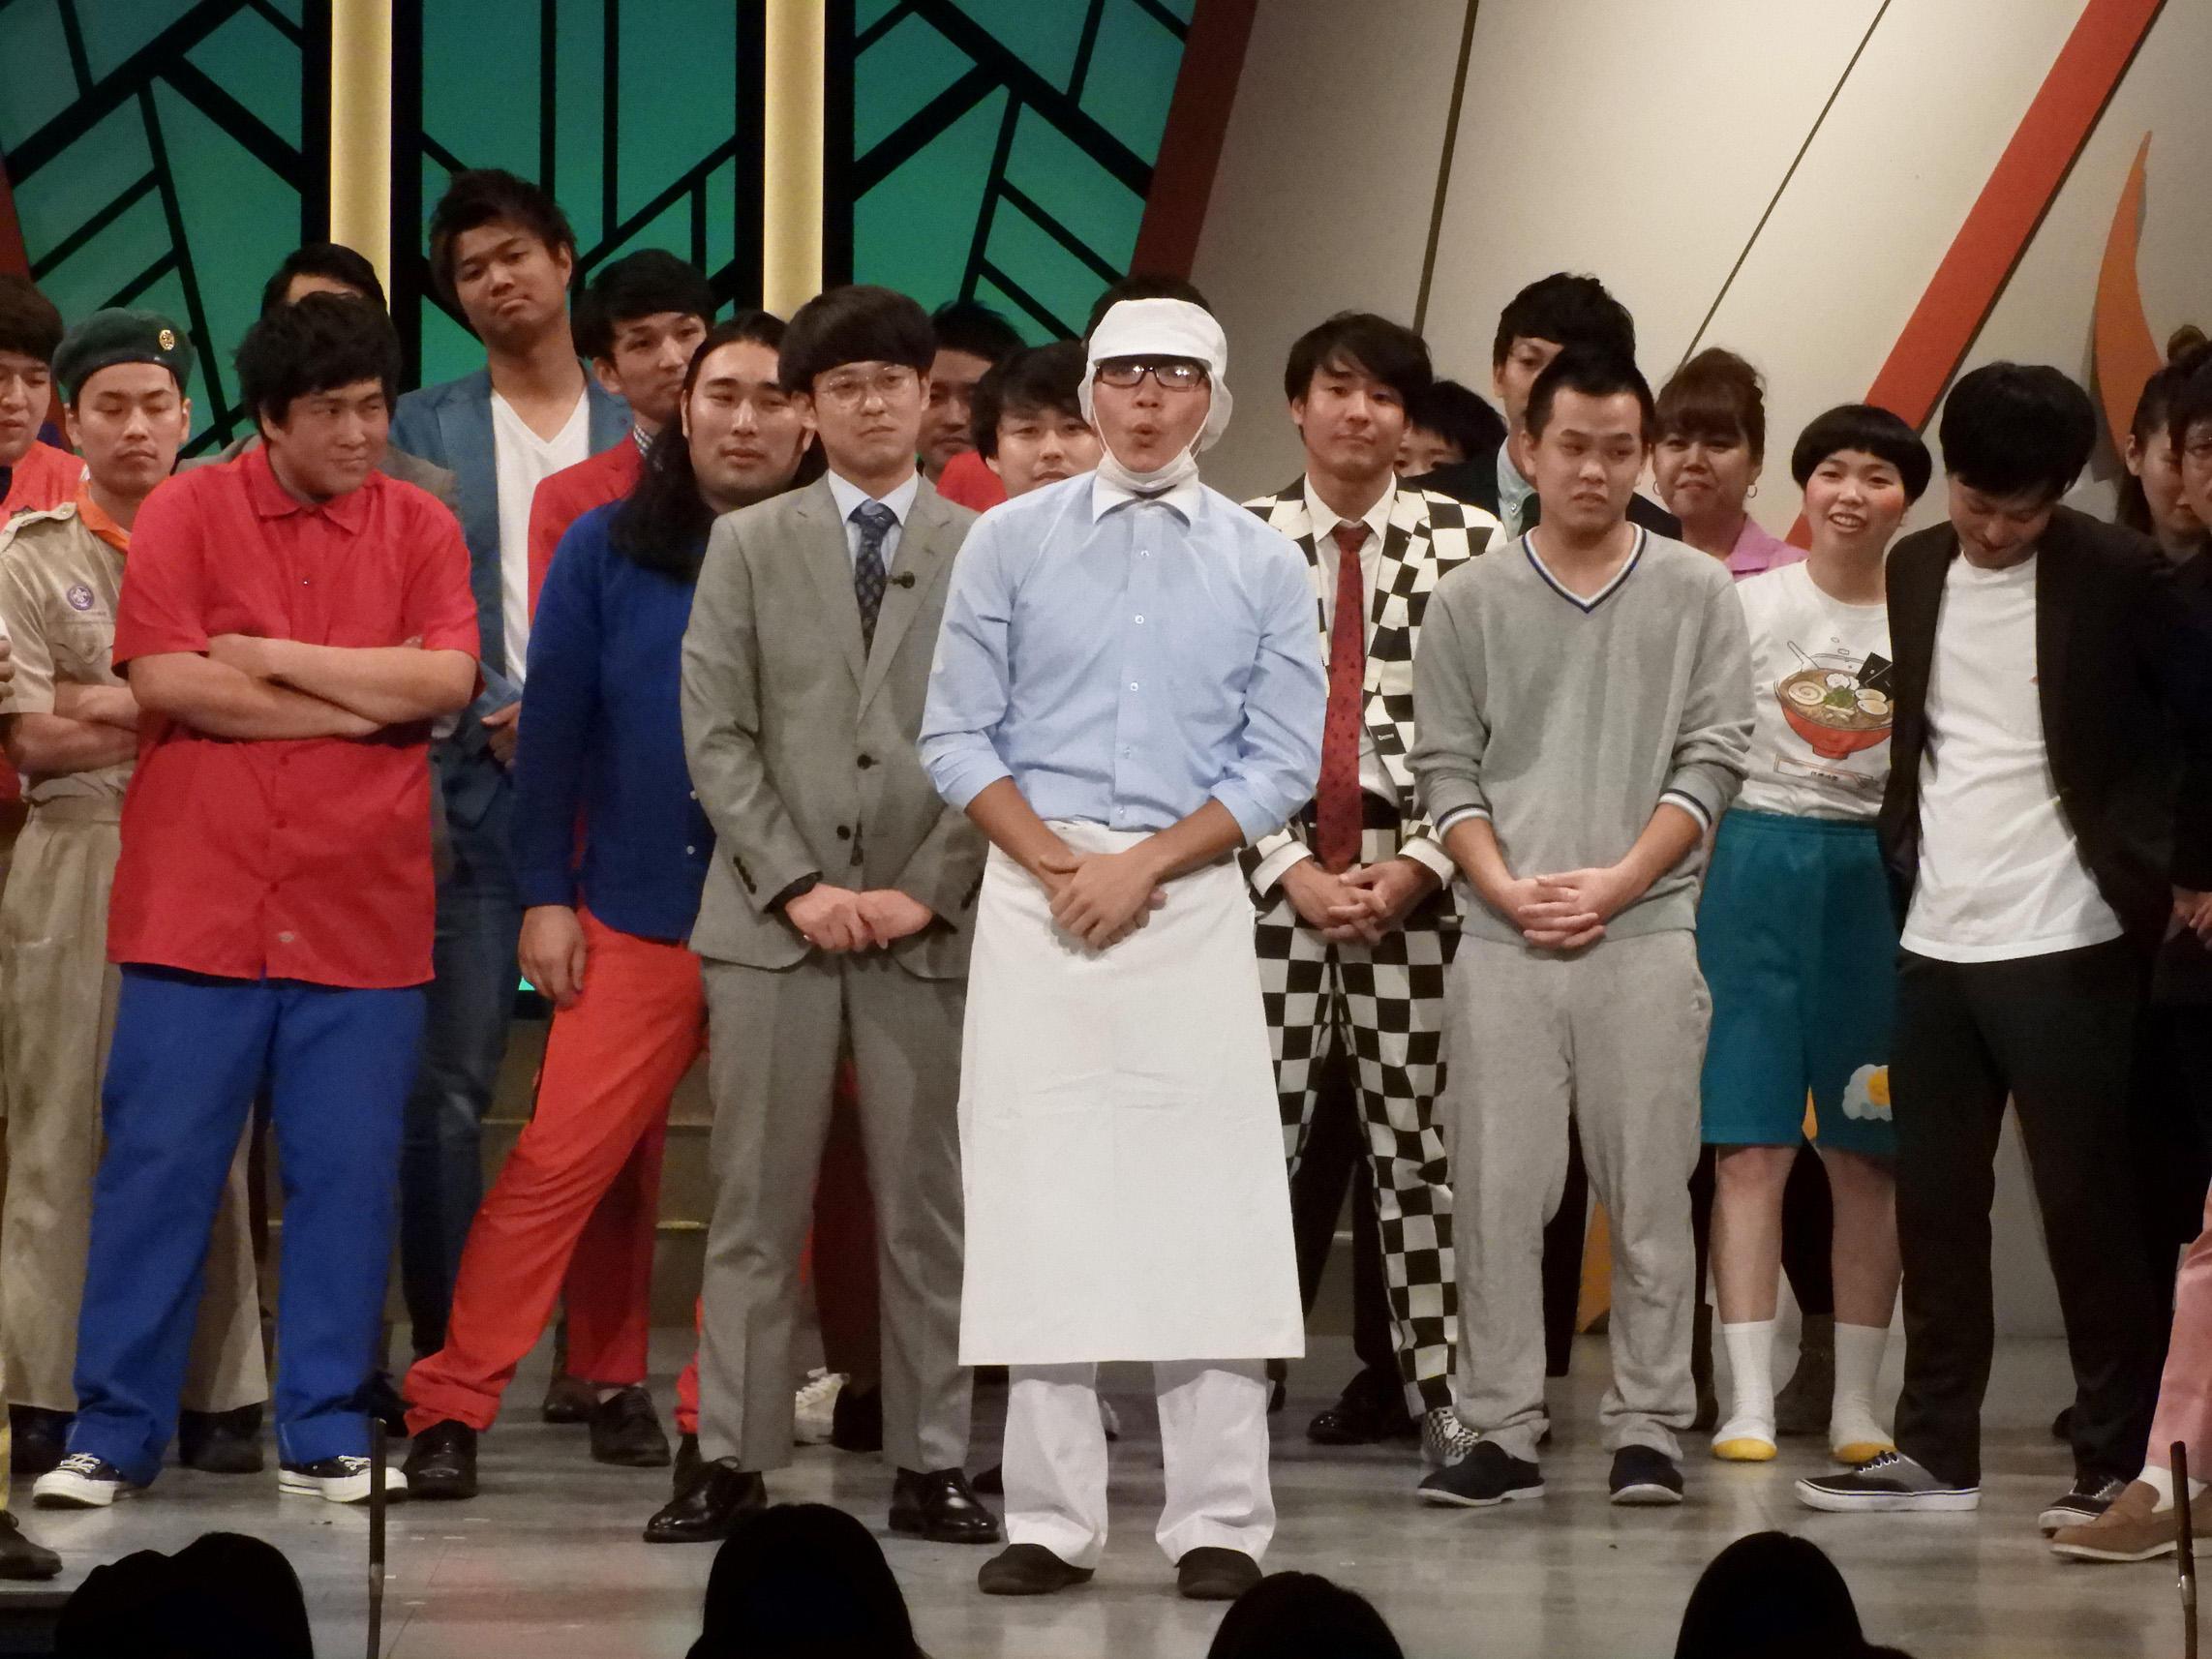 http://news.yoshimoto.co.jp/20180914111247-38c07352c1868590467ab47a0d54ffc690d977e5.jpg